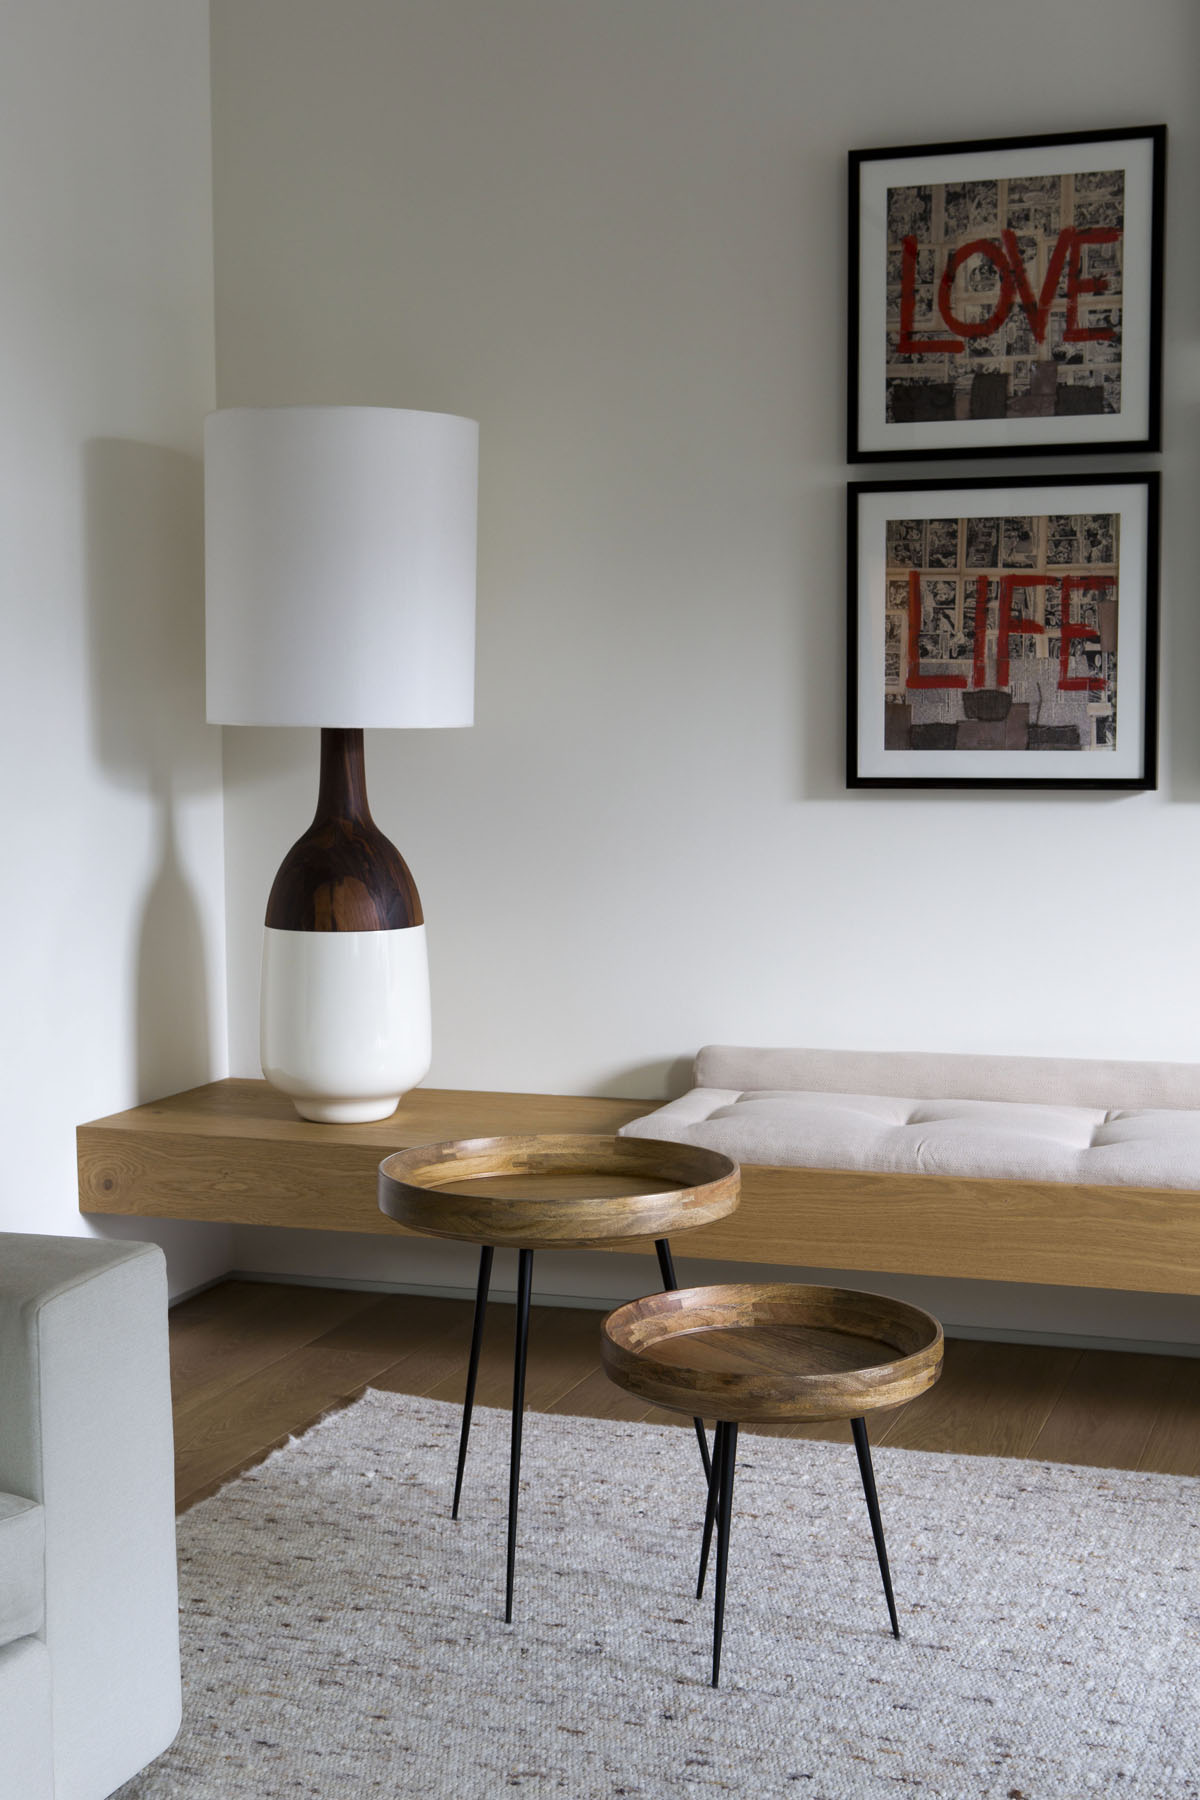 05 bonucci Sleek Modern by Fabio Fantolino